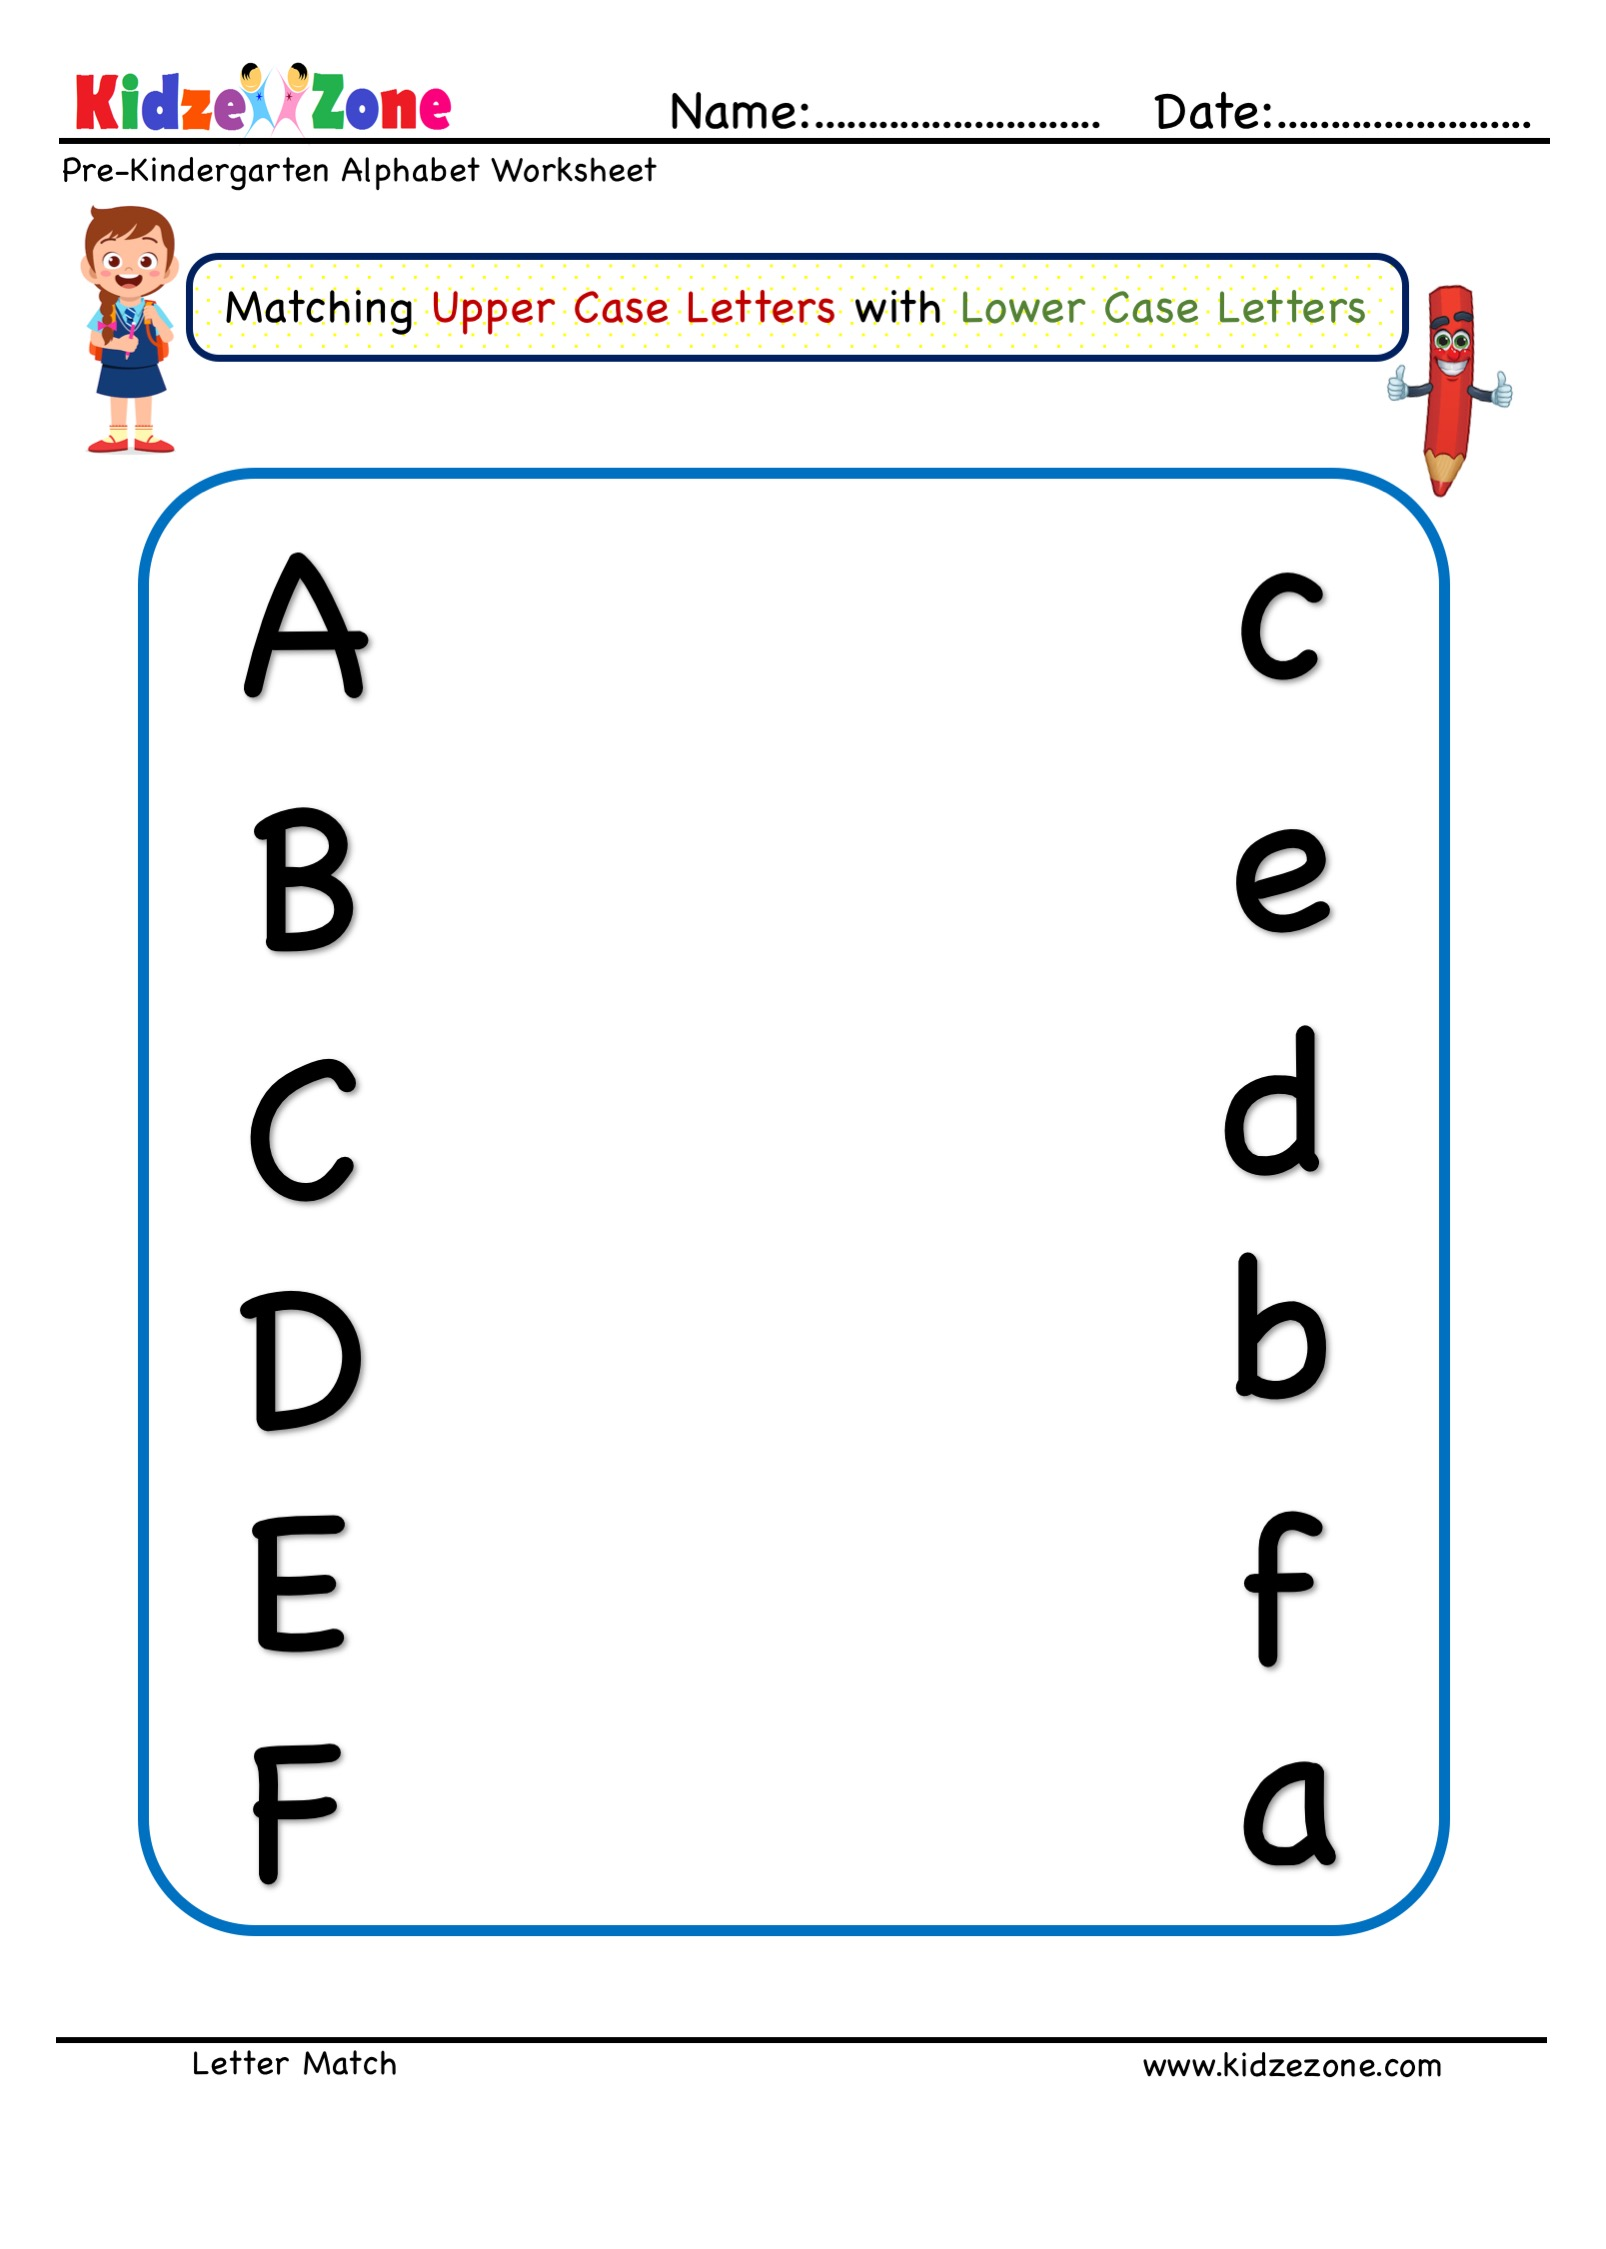 Preschool Letter Matching Worksheet Upper Case To Lower